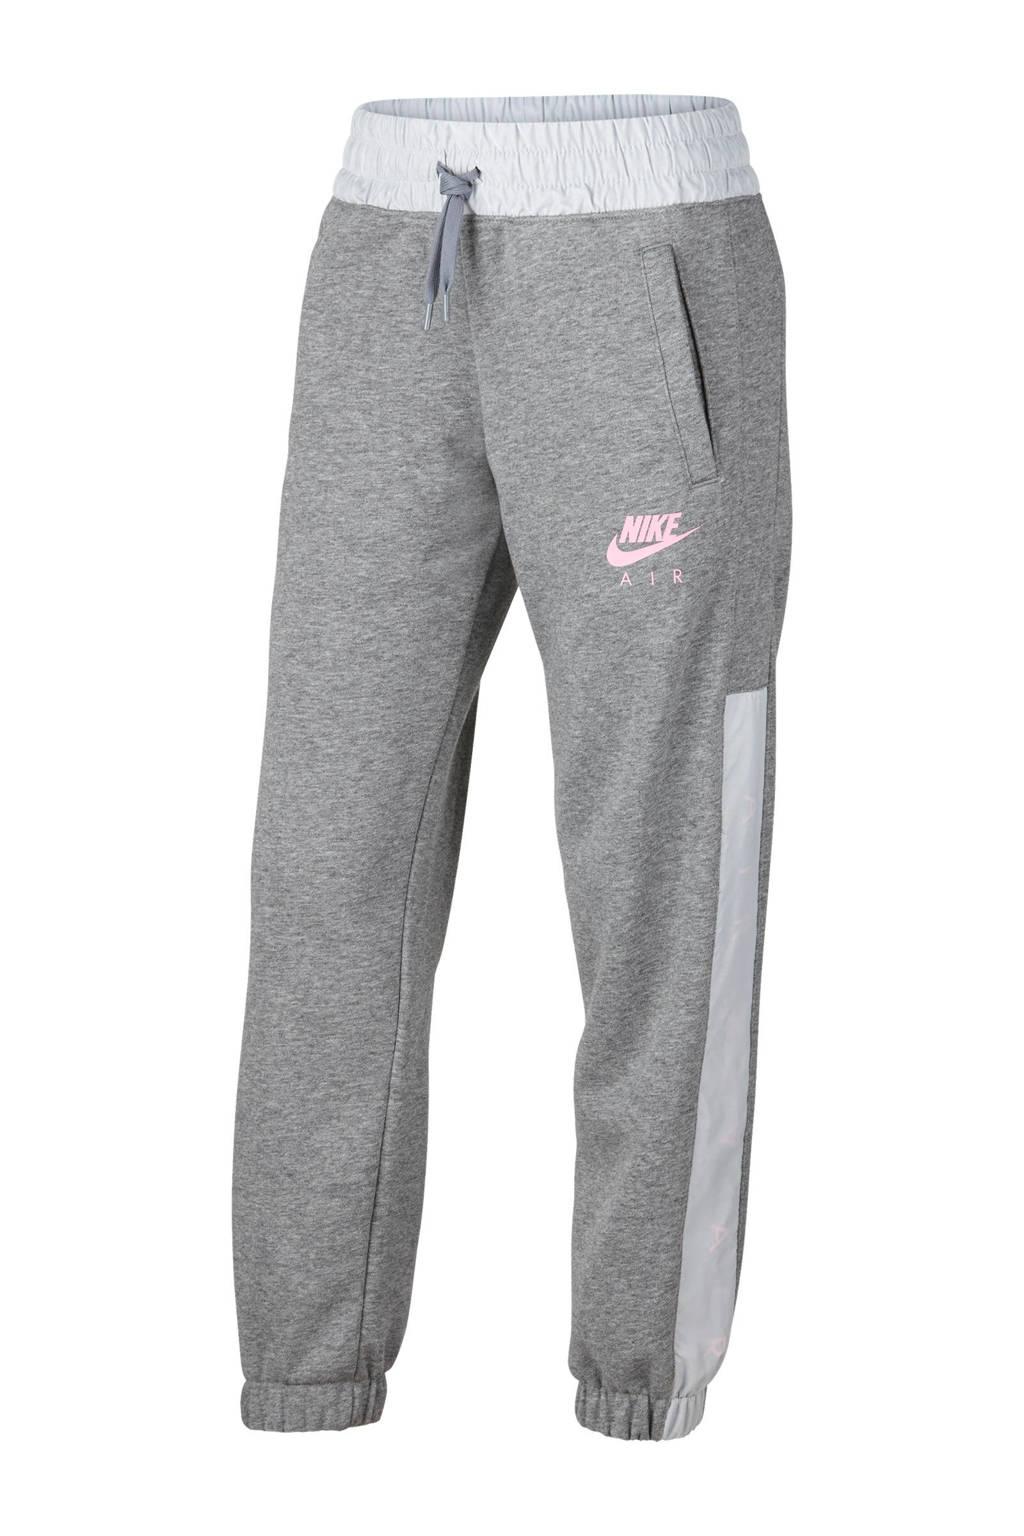 Nike joggingbroek grijs melange/wit, Grijs melange/wit